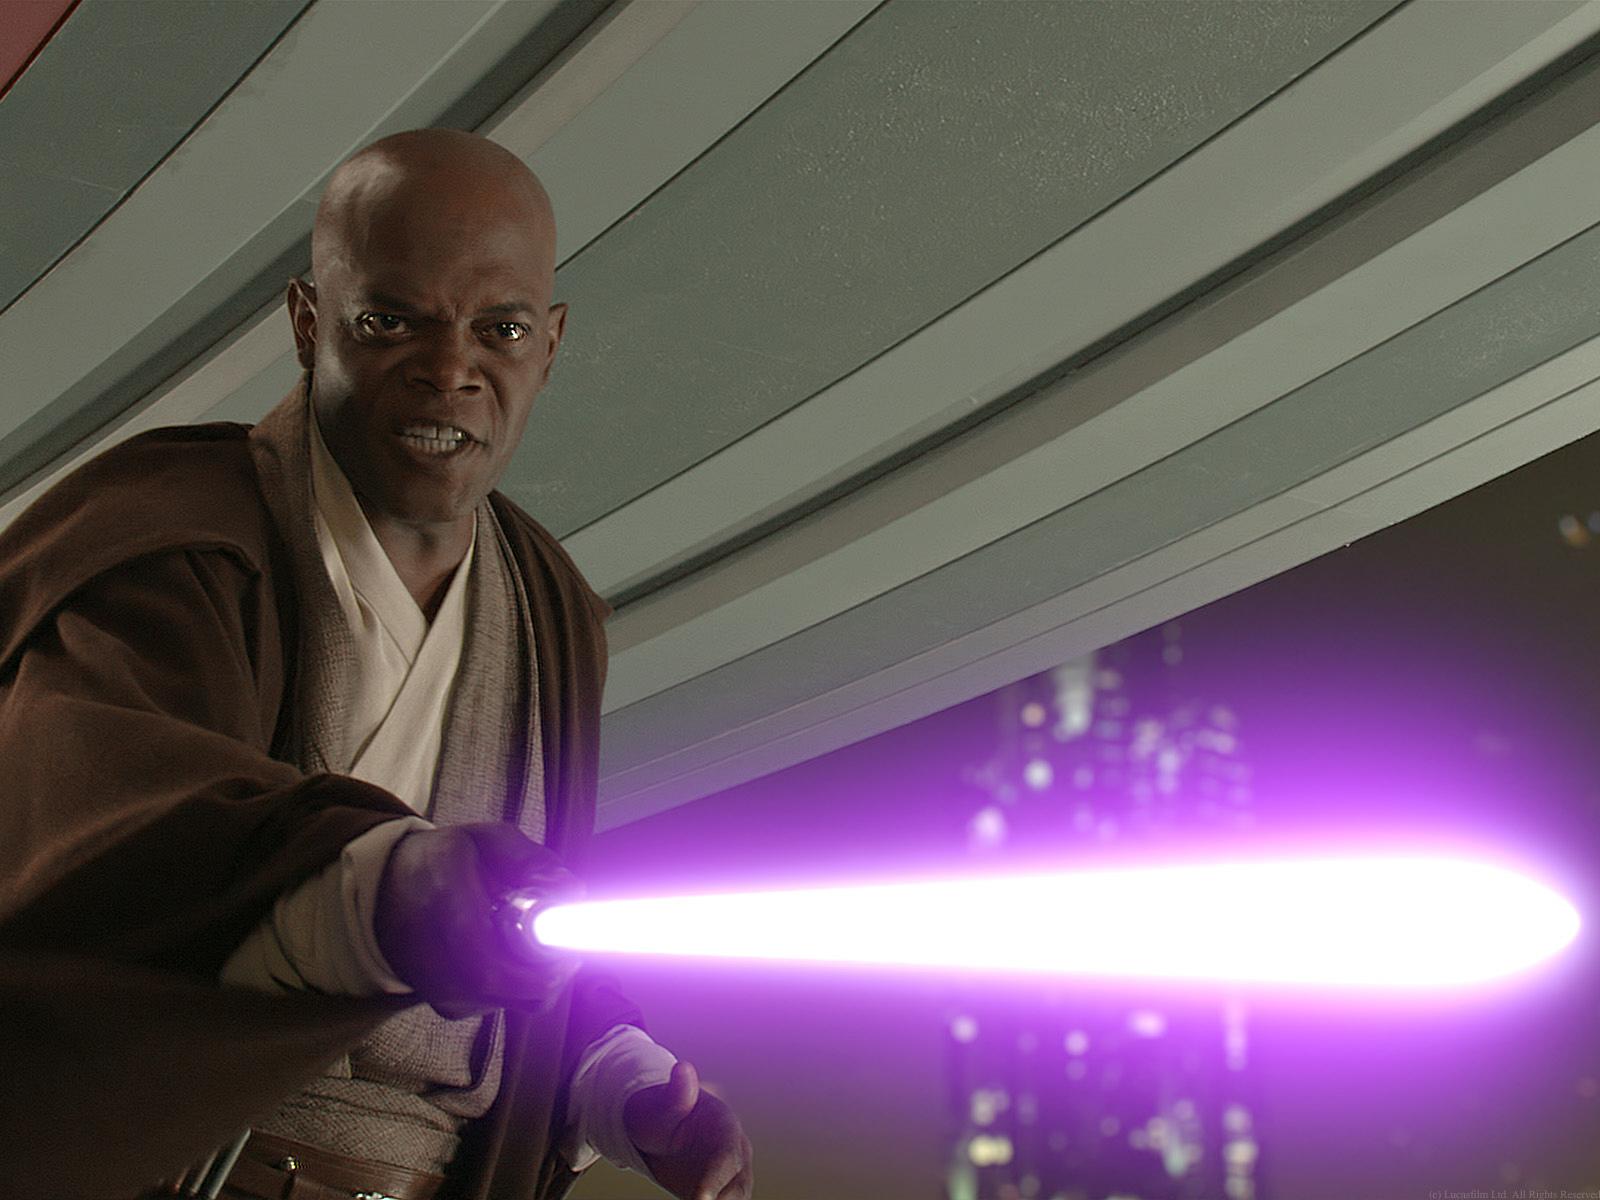 Star Wars George Lucas Wollte Offenbar Tupac Statt Samuel L